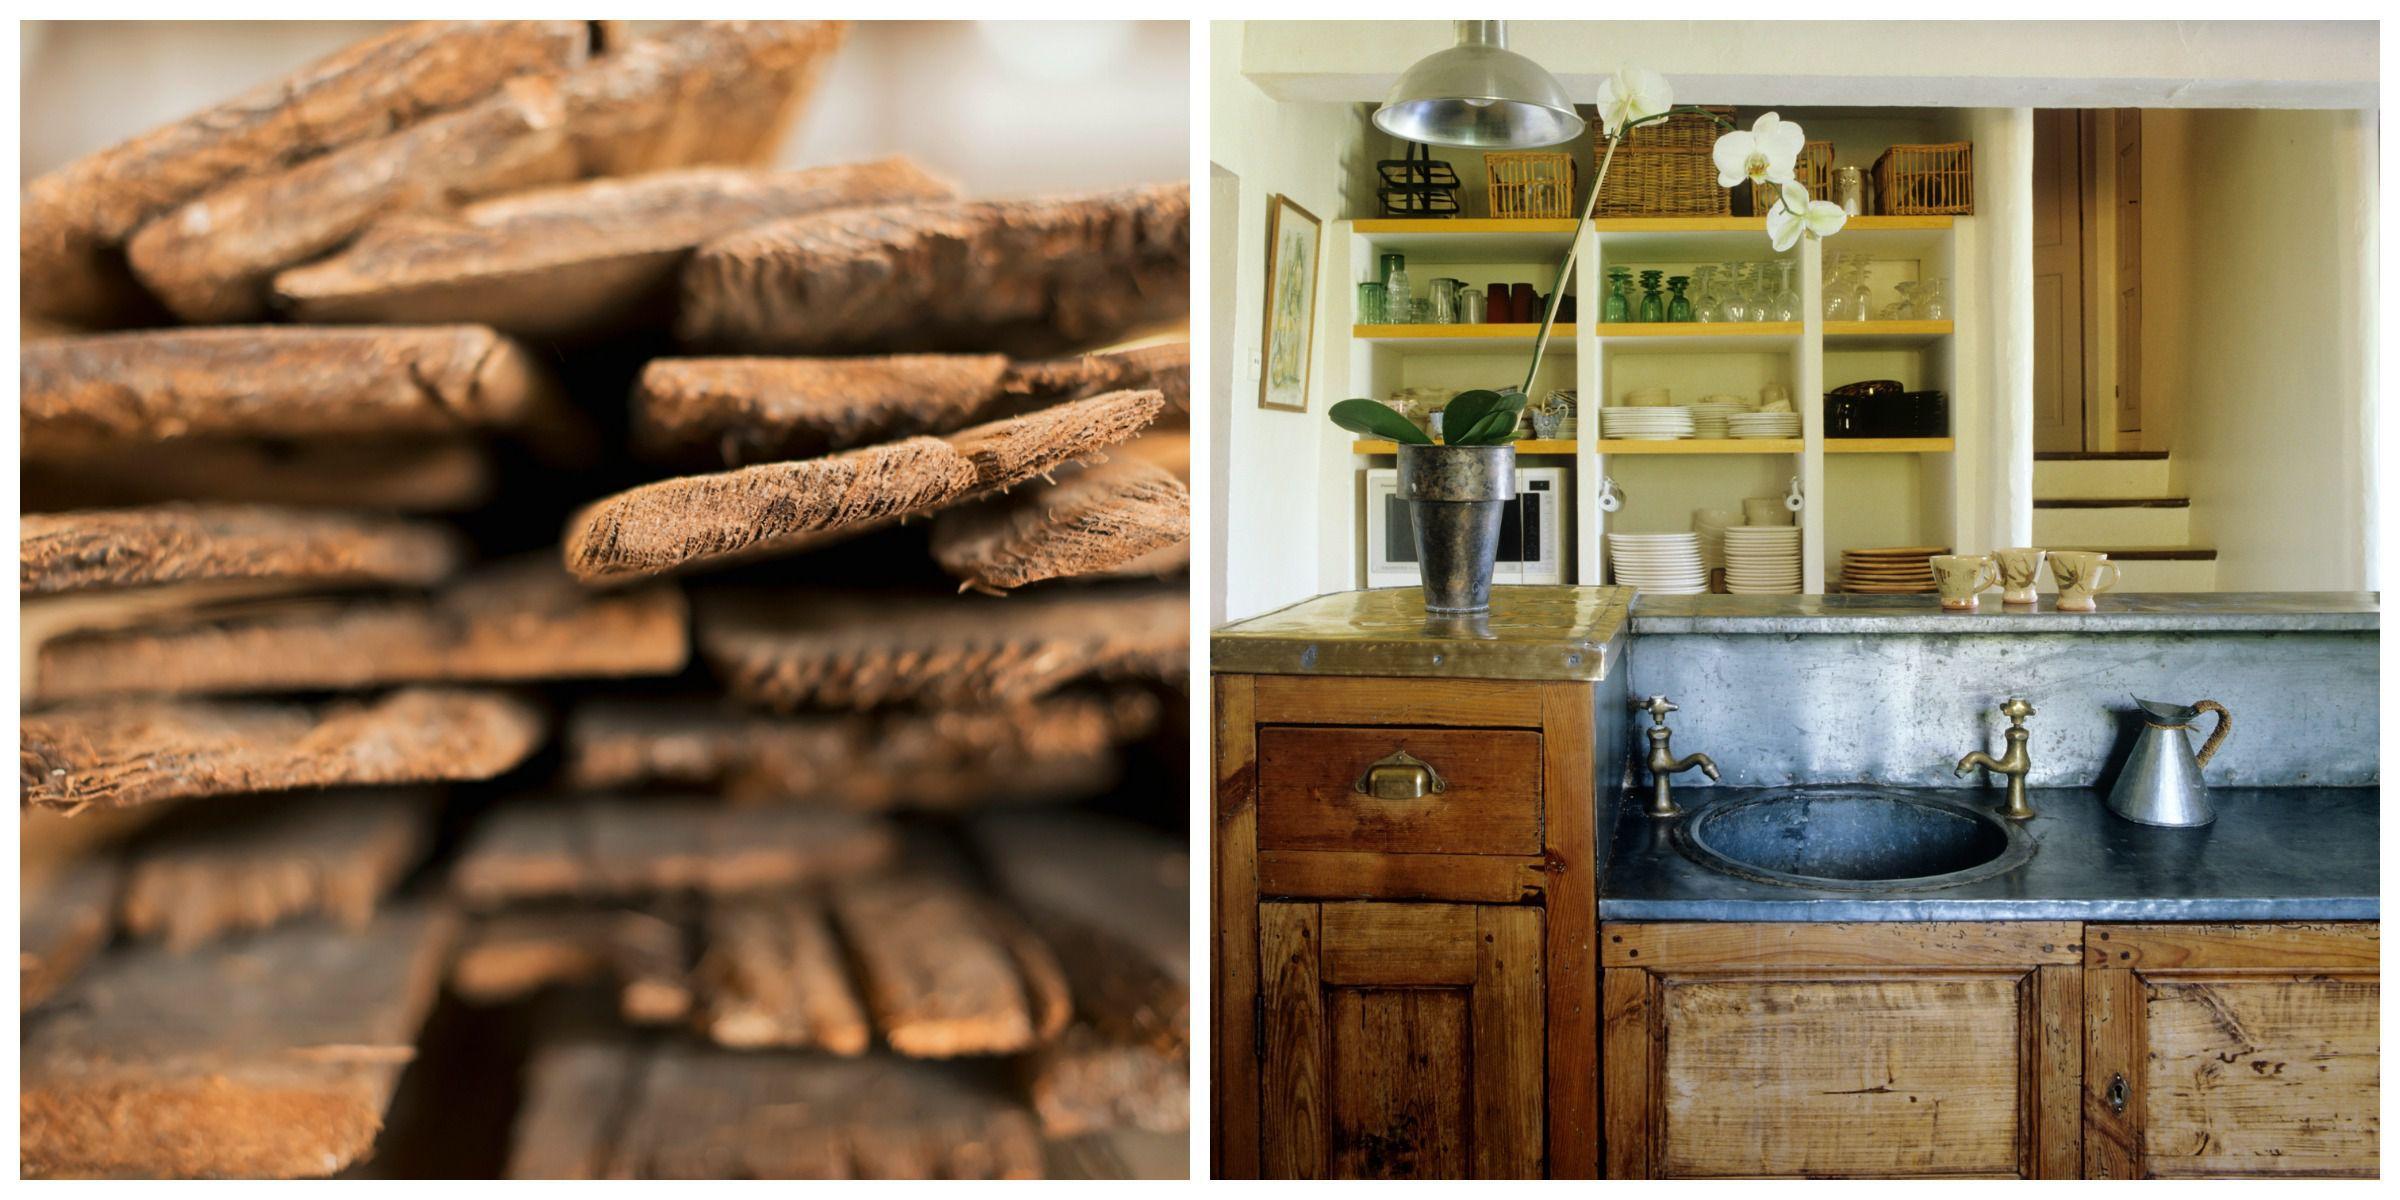 where-to-buy-reclaimed-wood-1528912819.jpg